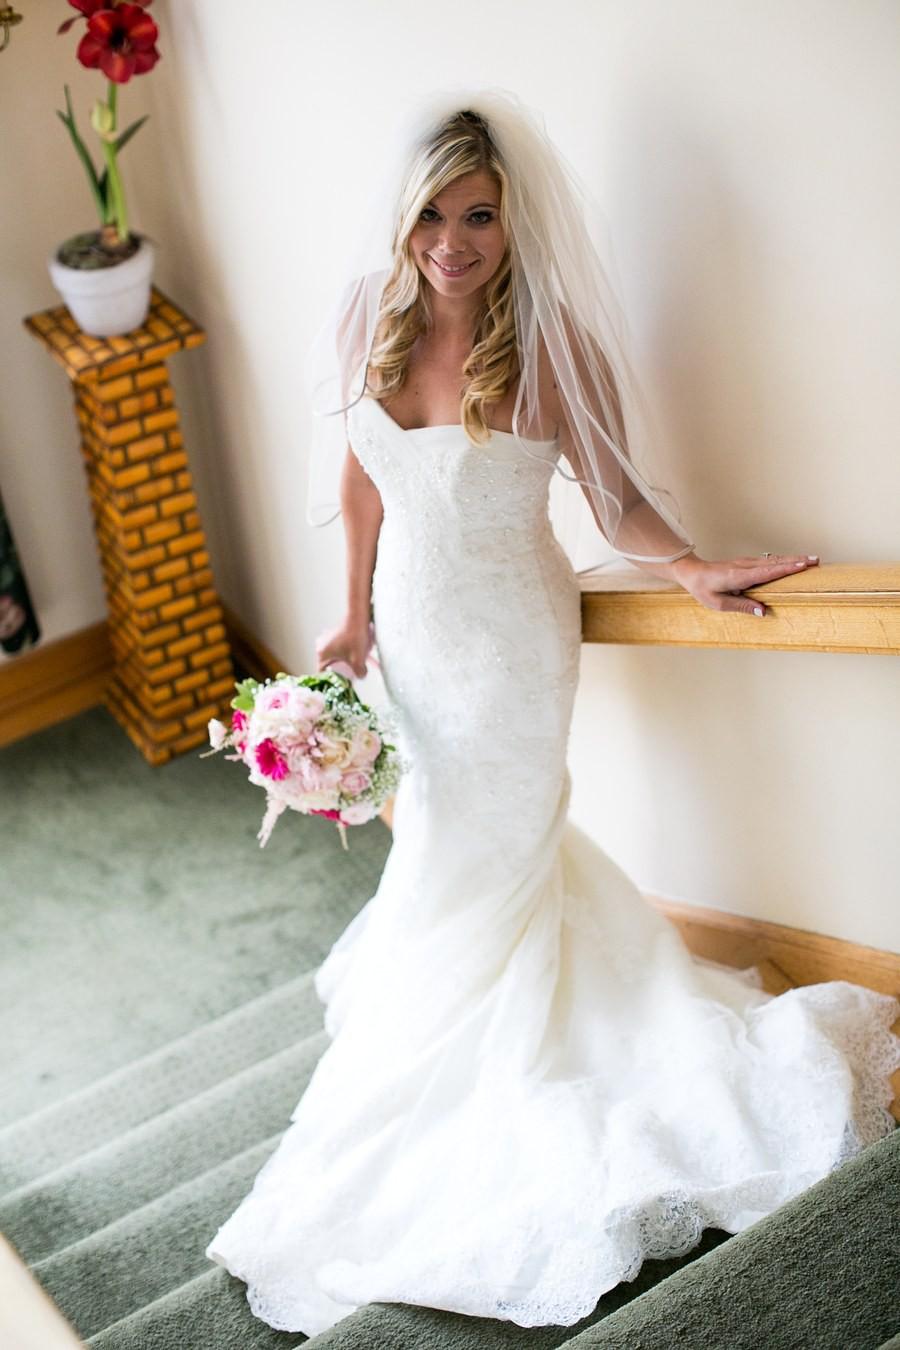 Ellis bridal 11330 second hand wedding dress on sale 55 off for Second hand wedding dresses san diego